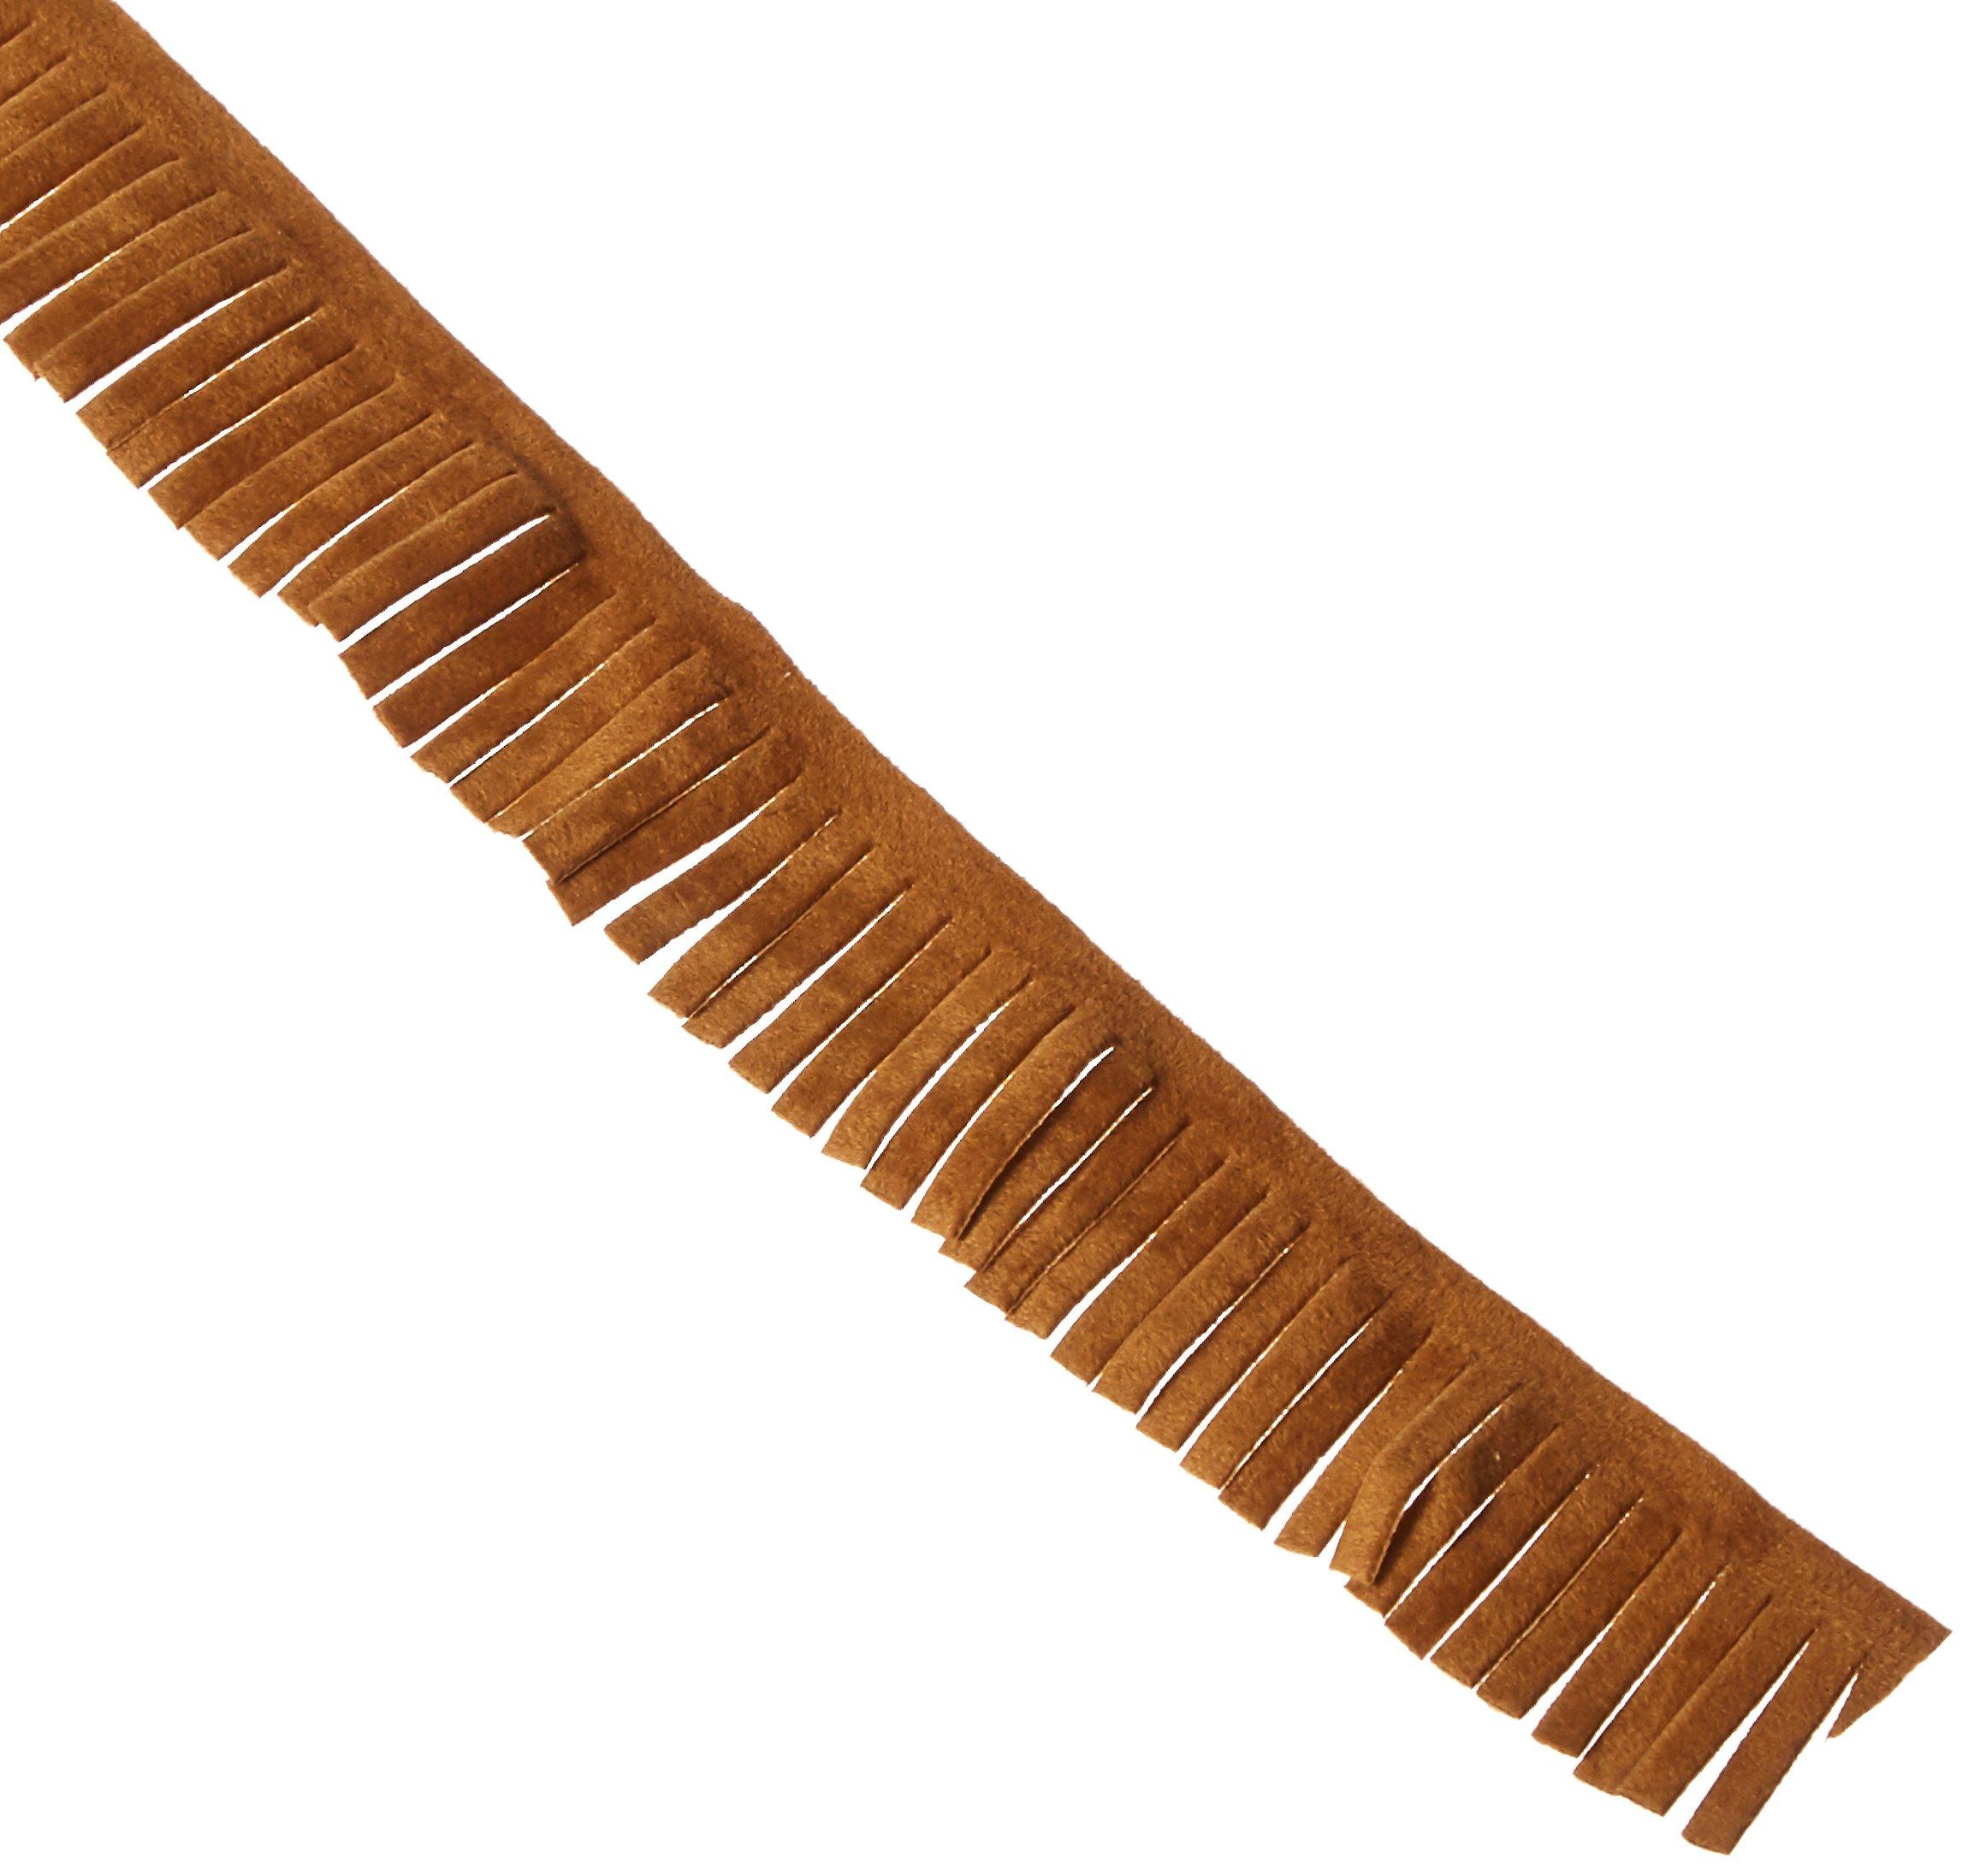 Decorative Trimmings Brown Faux Suede Fringe Trim 1'' X18yd, 1'' x 18 yd